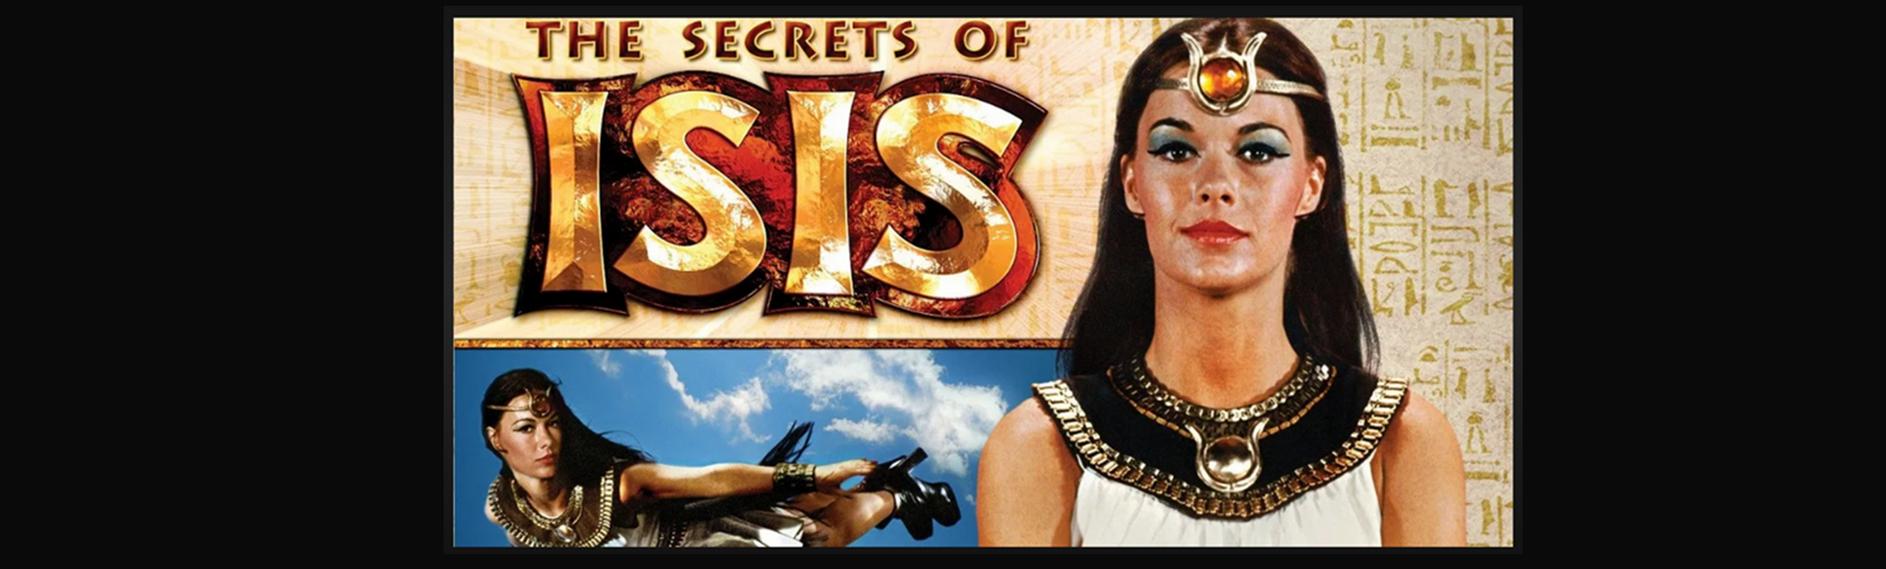 Secret  of Isus.png